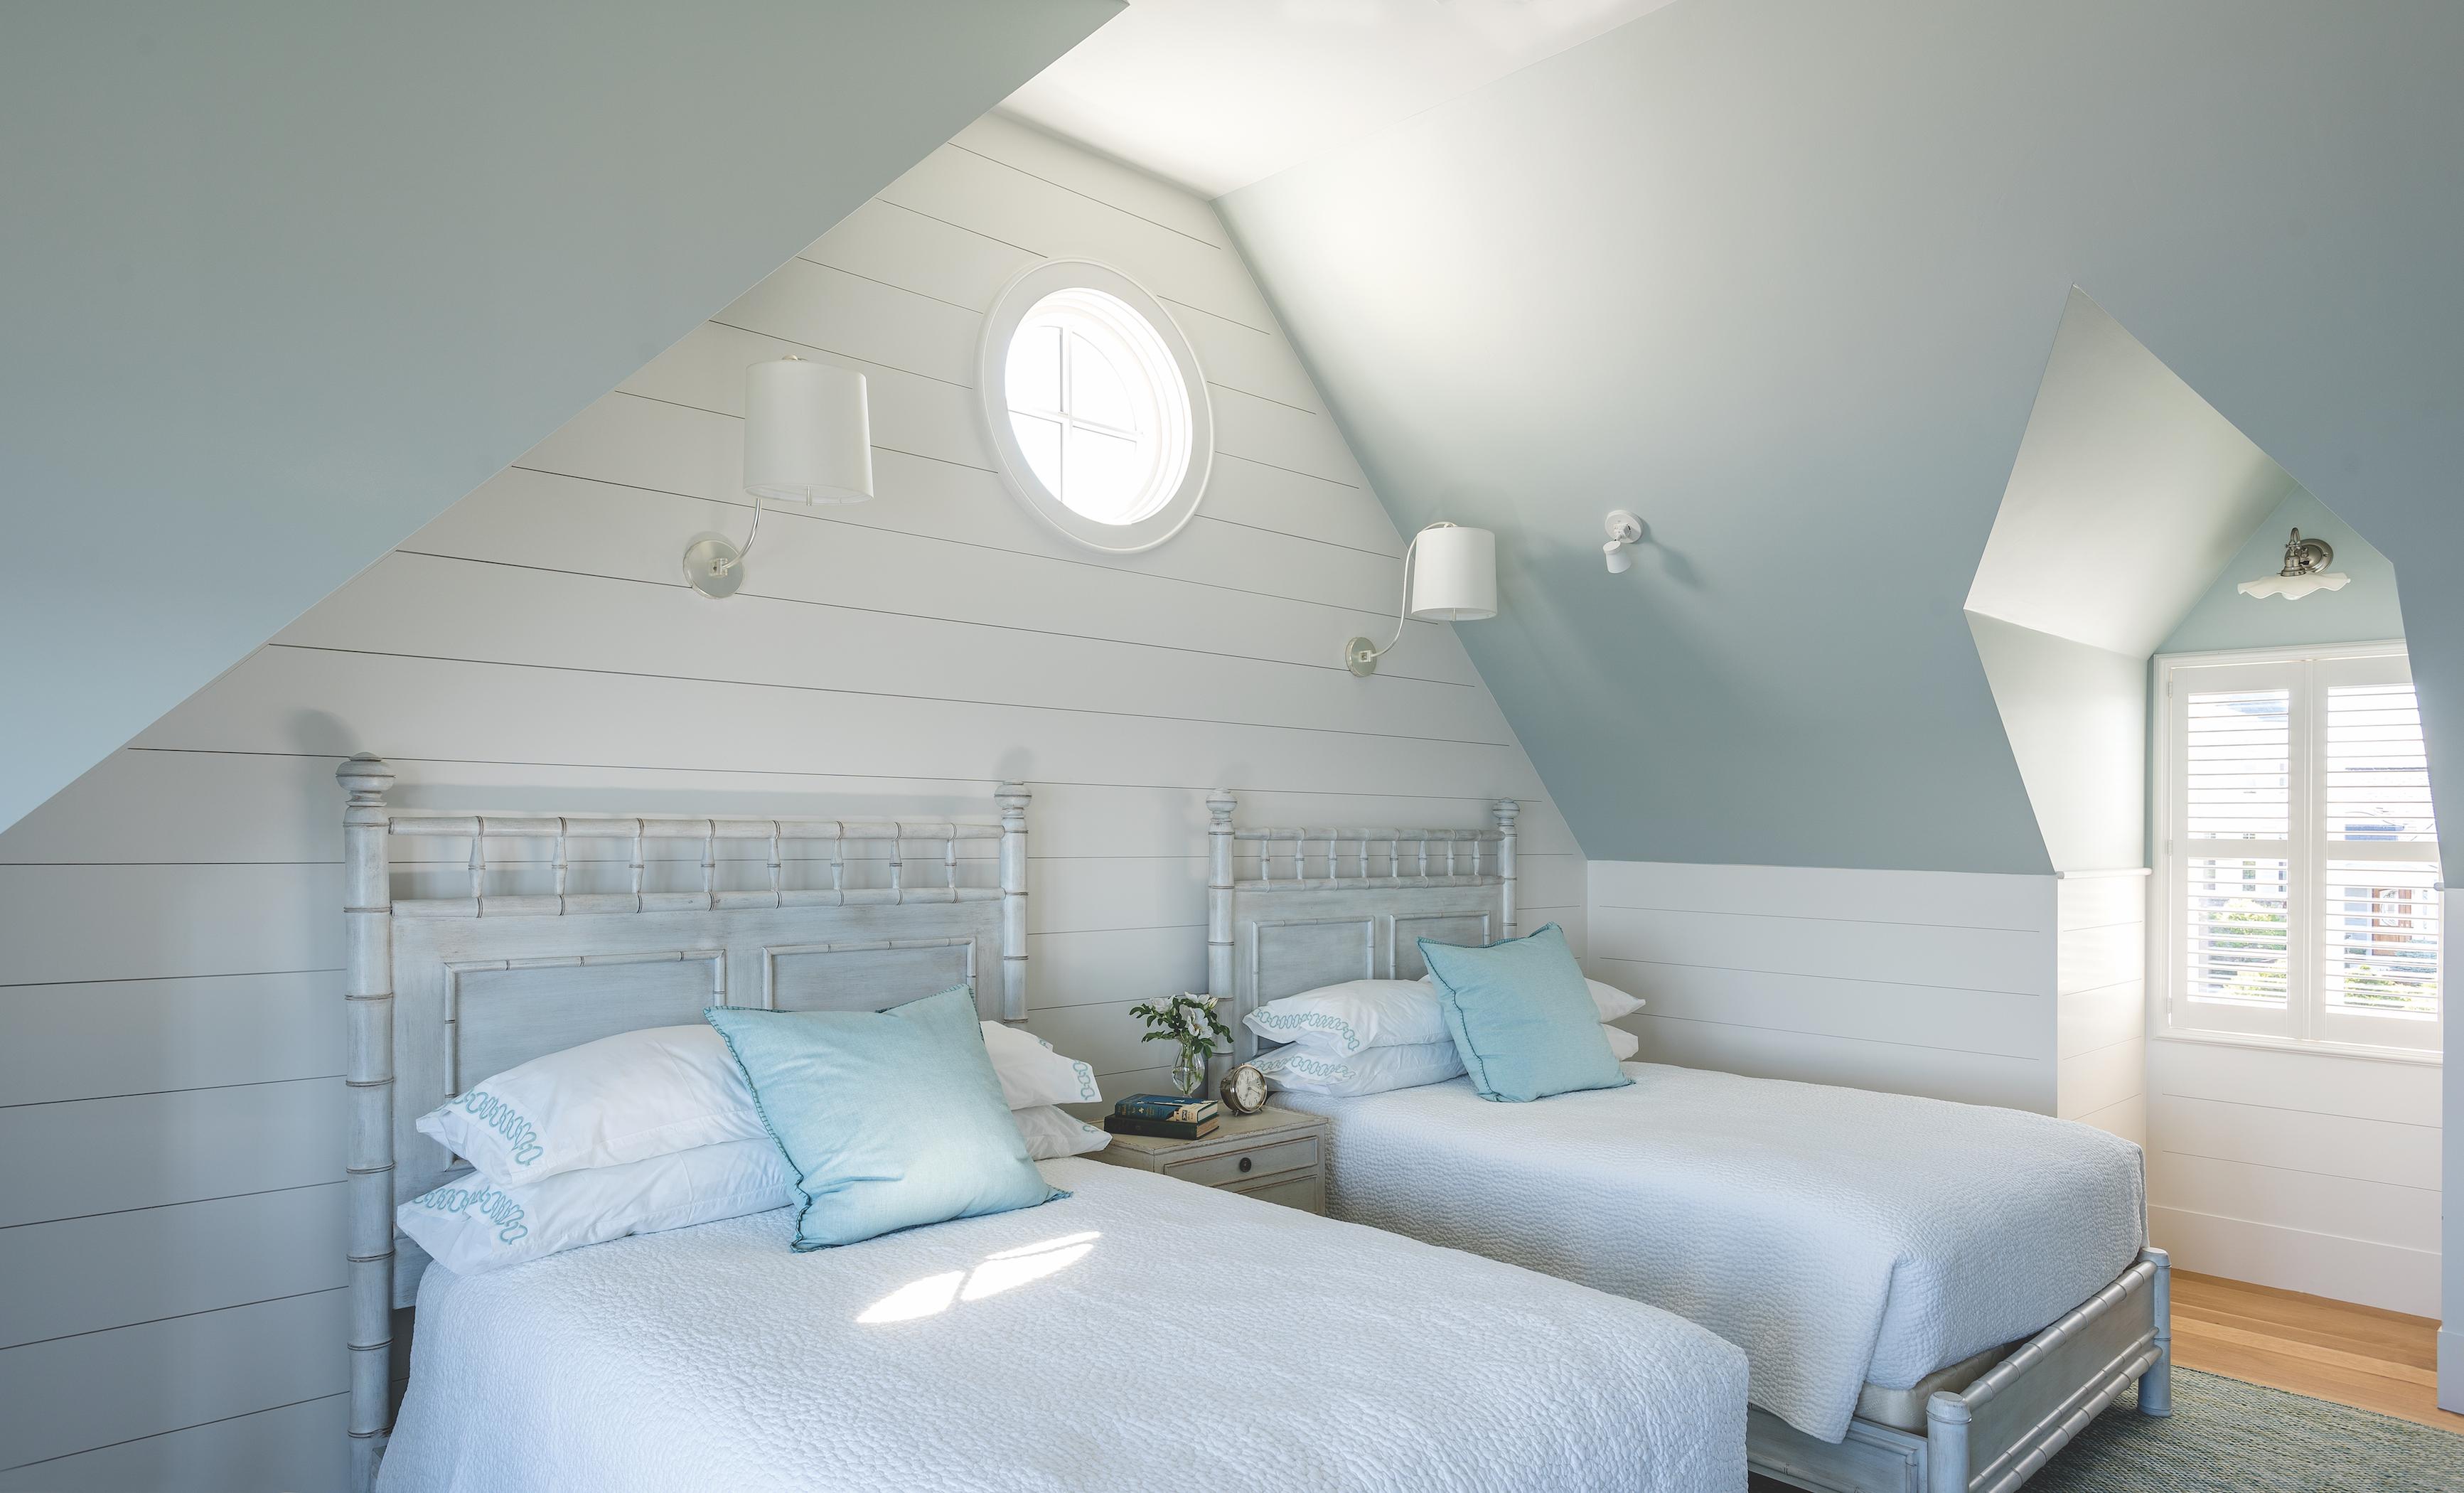 Guest Bedroom at Ship's Channel, Cape Elizabeth, by Banks Design Associates Ltd.